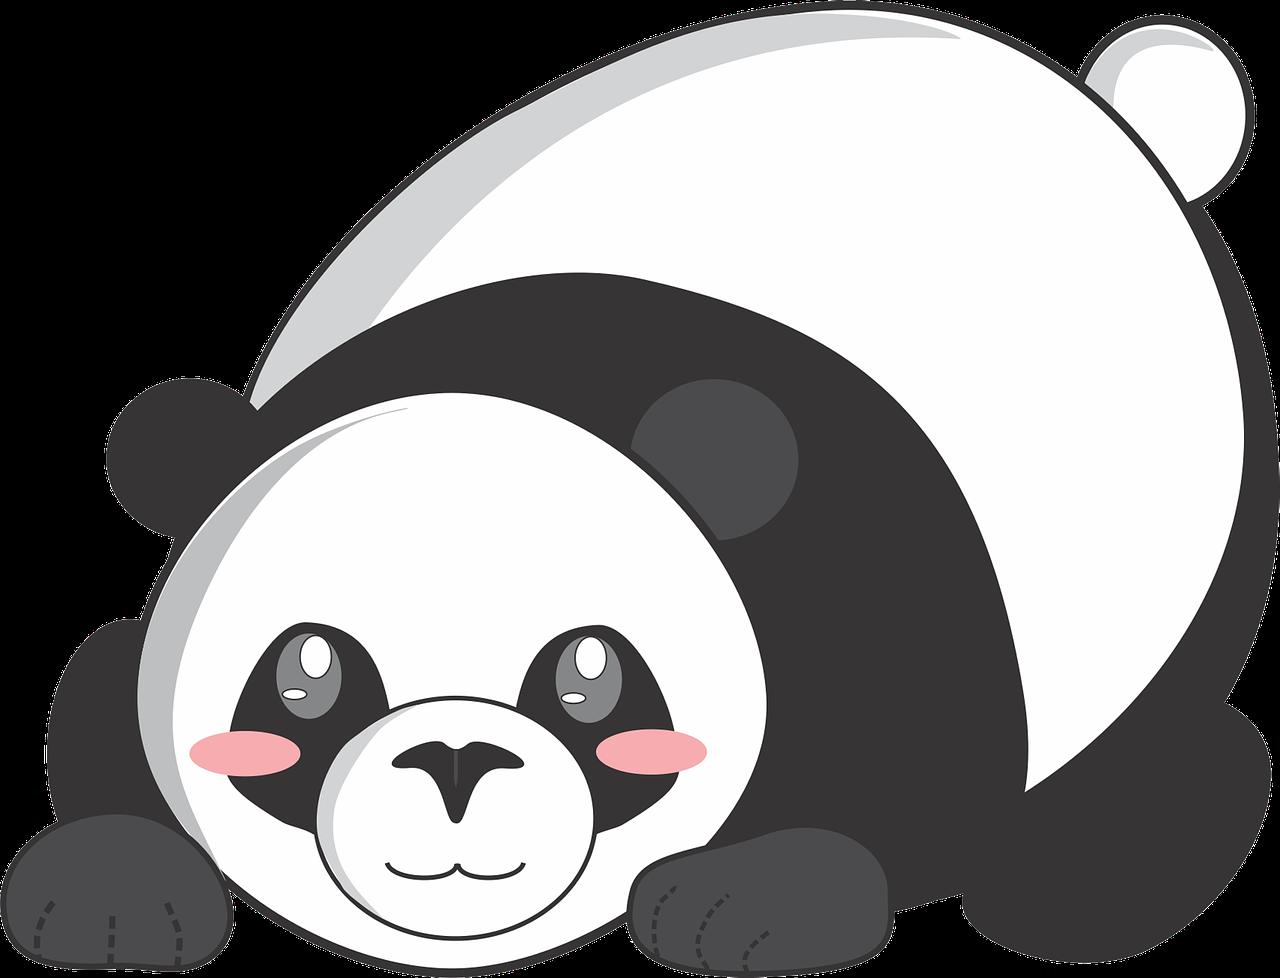 Panda Stickers - 2018 messages sticker-5